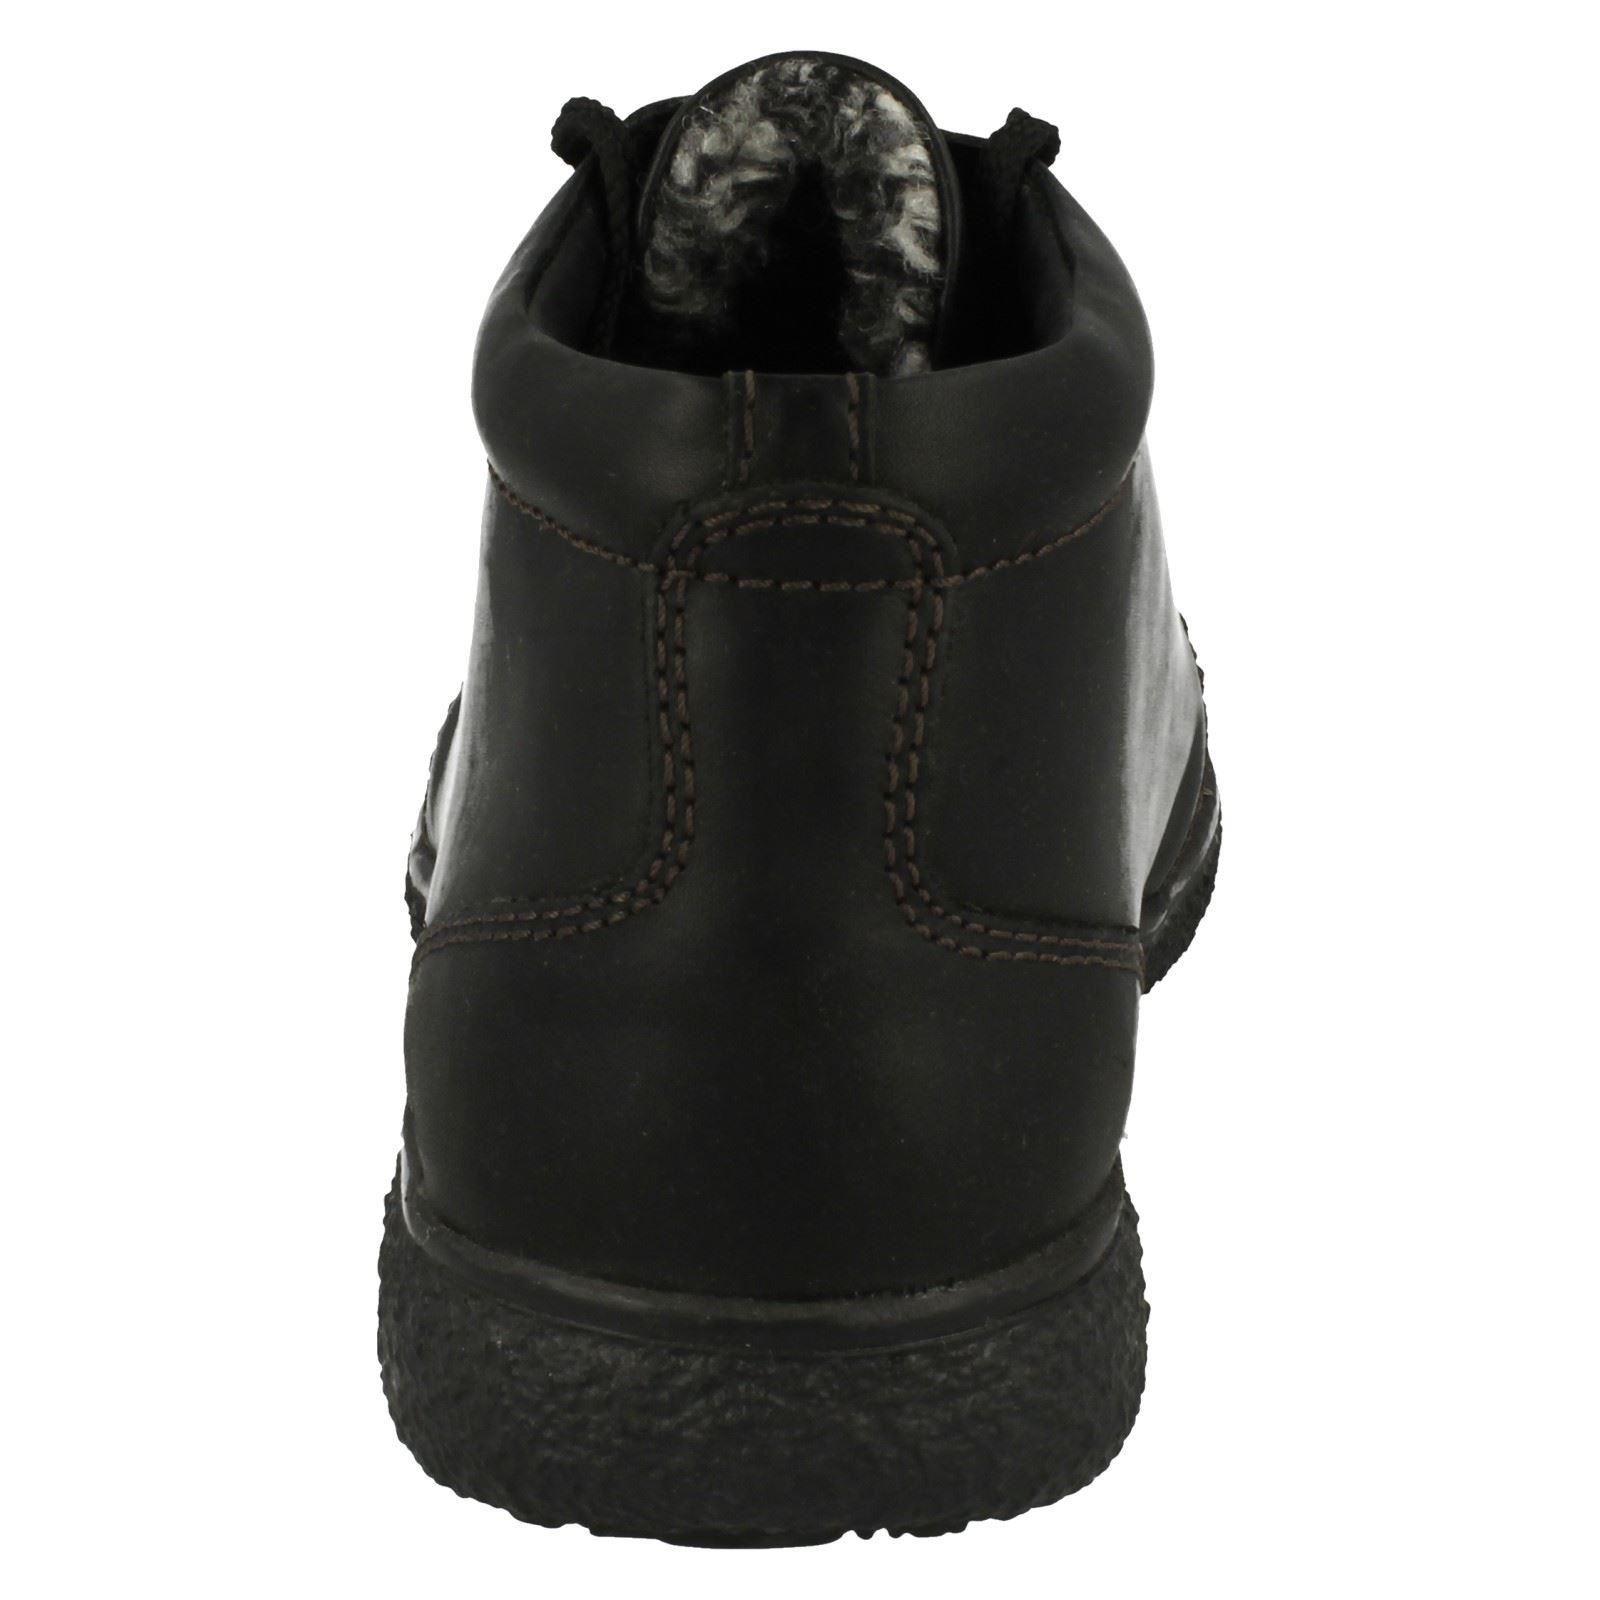 Uomo Padders Warmlined Mel Lace Up Ankle Stiefel Mel Warmlined dcb640